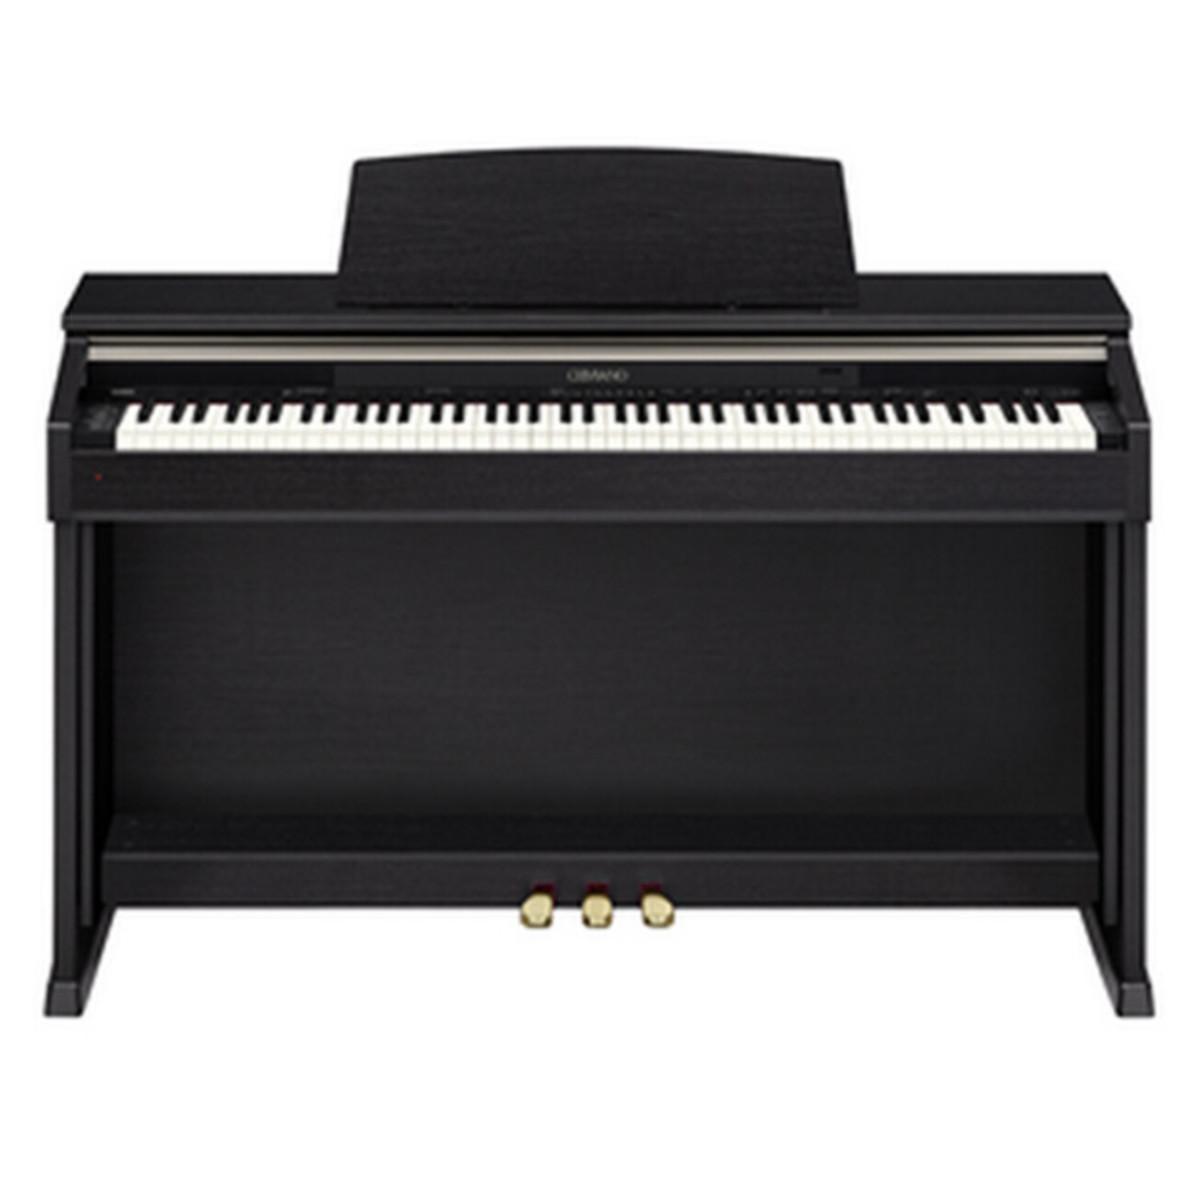 disc casio celviano ap 420 digital piano black at. Black Bedroom Furniture Sets. Home Design Ideas